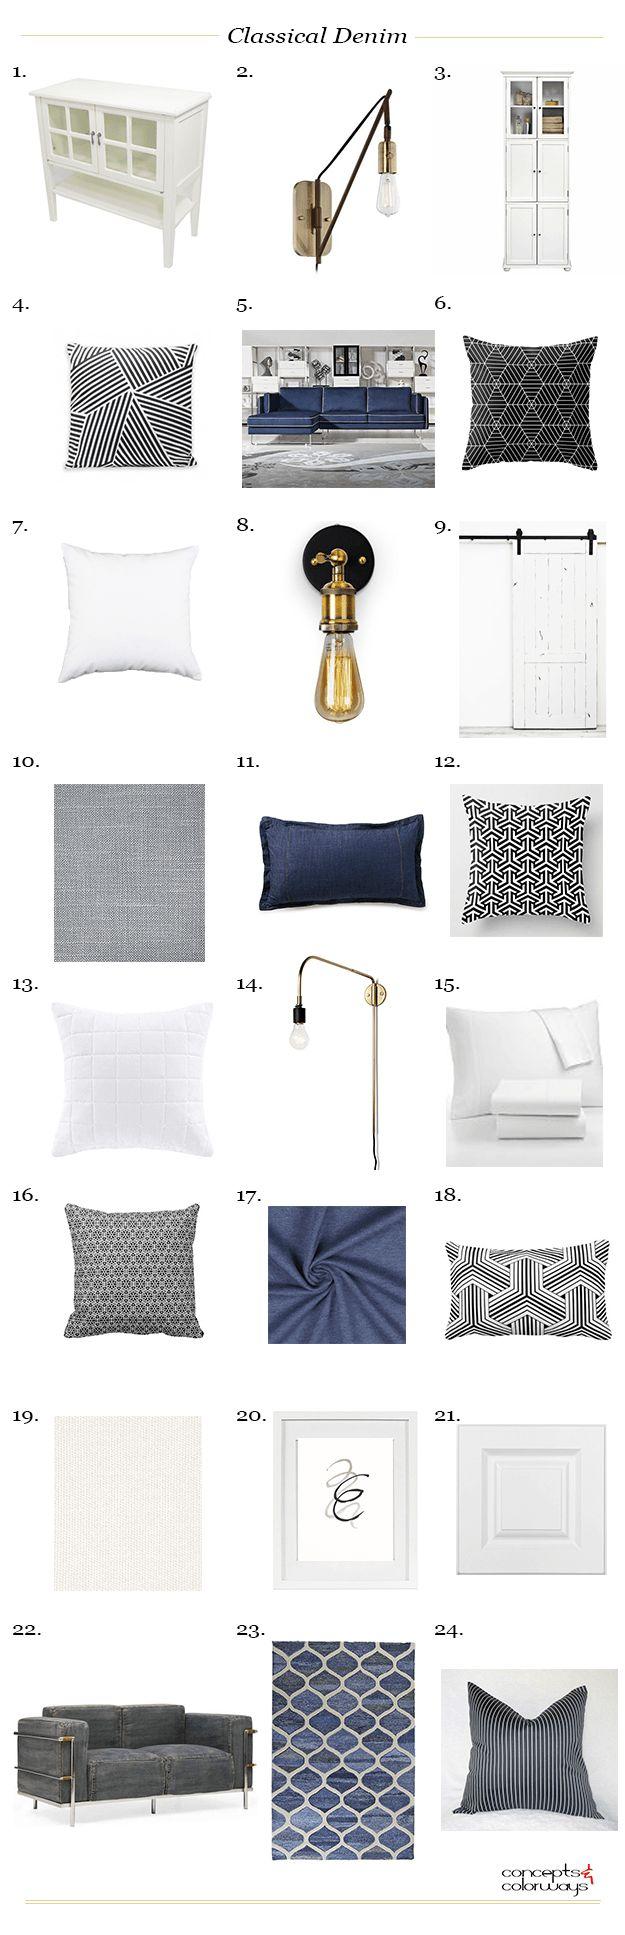 Best 25+ Denim sofa ideas only on Pinterest | Light blue couches ...